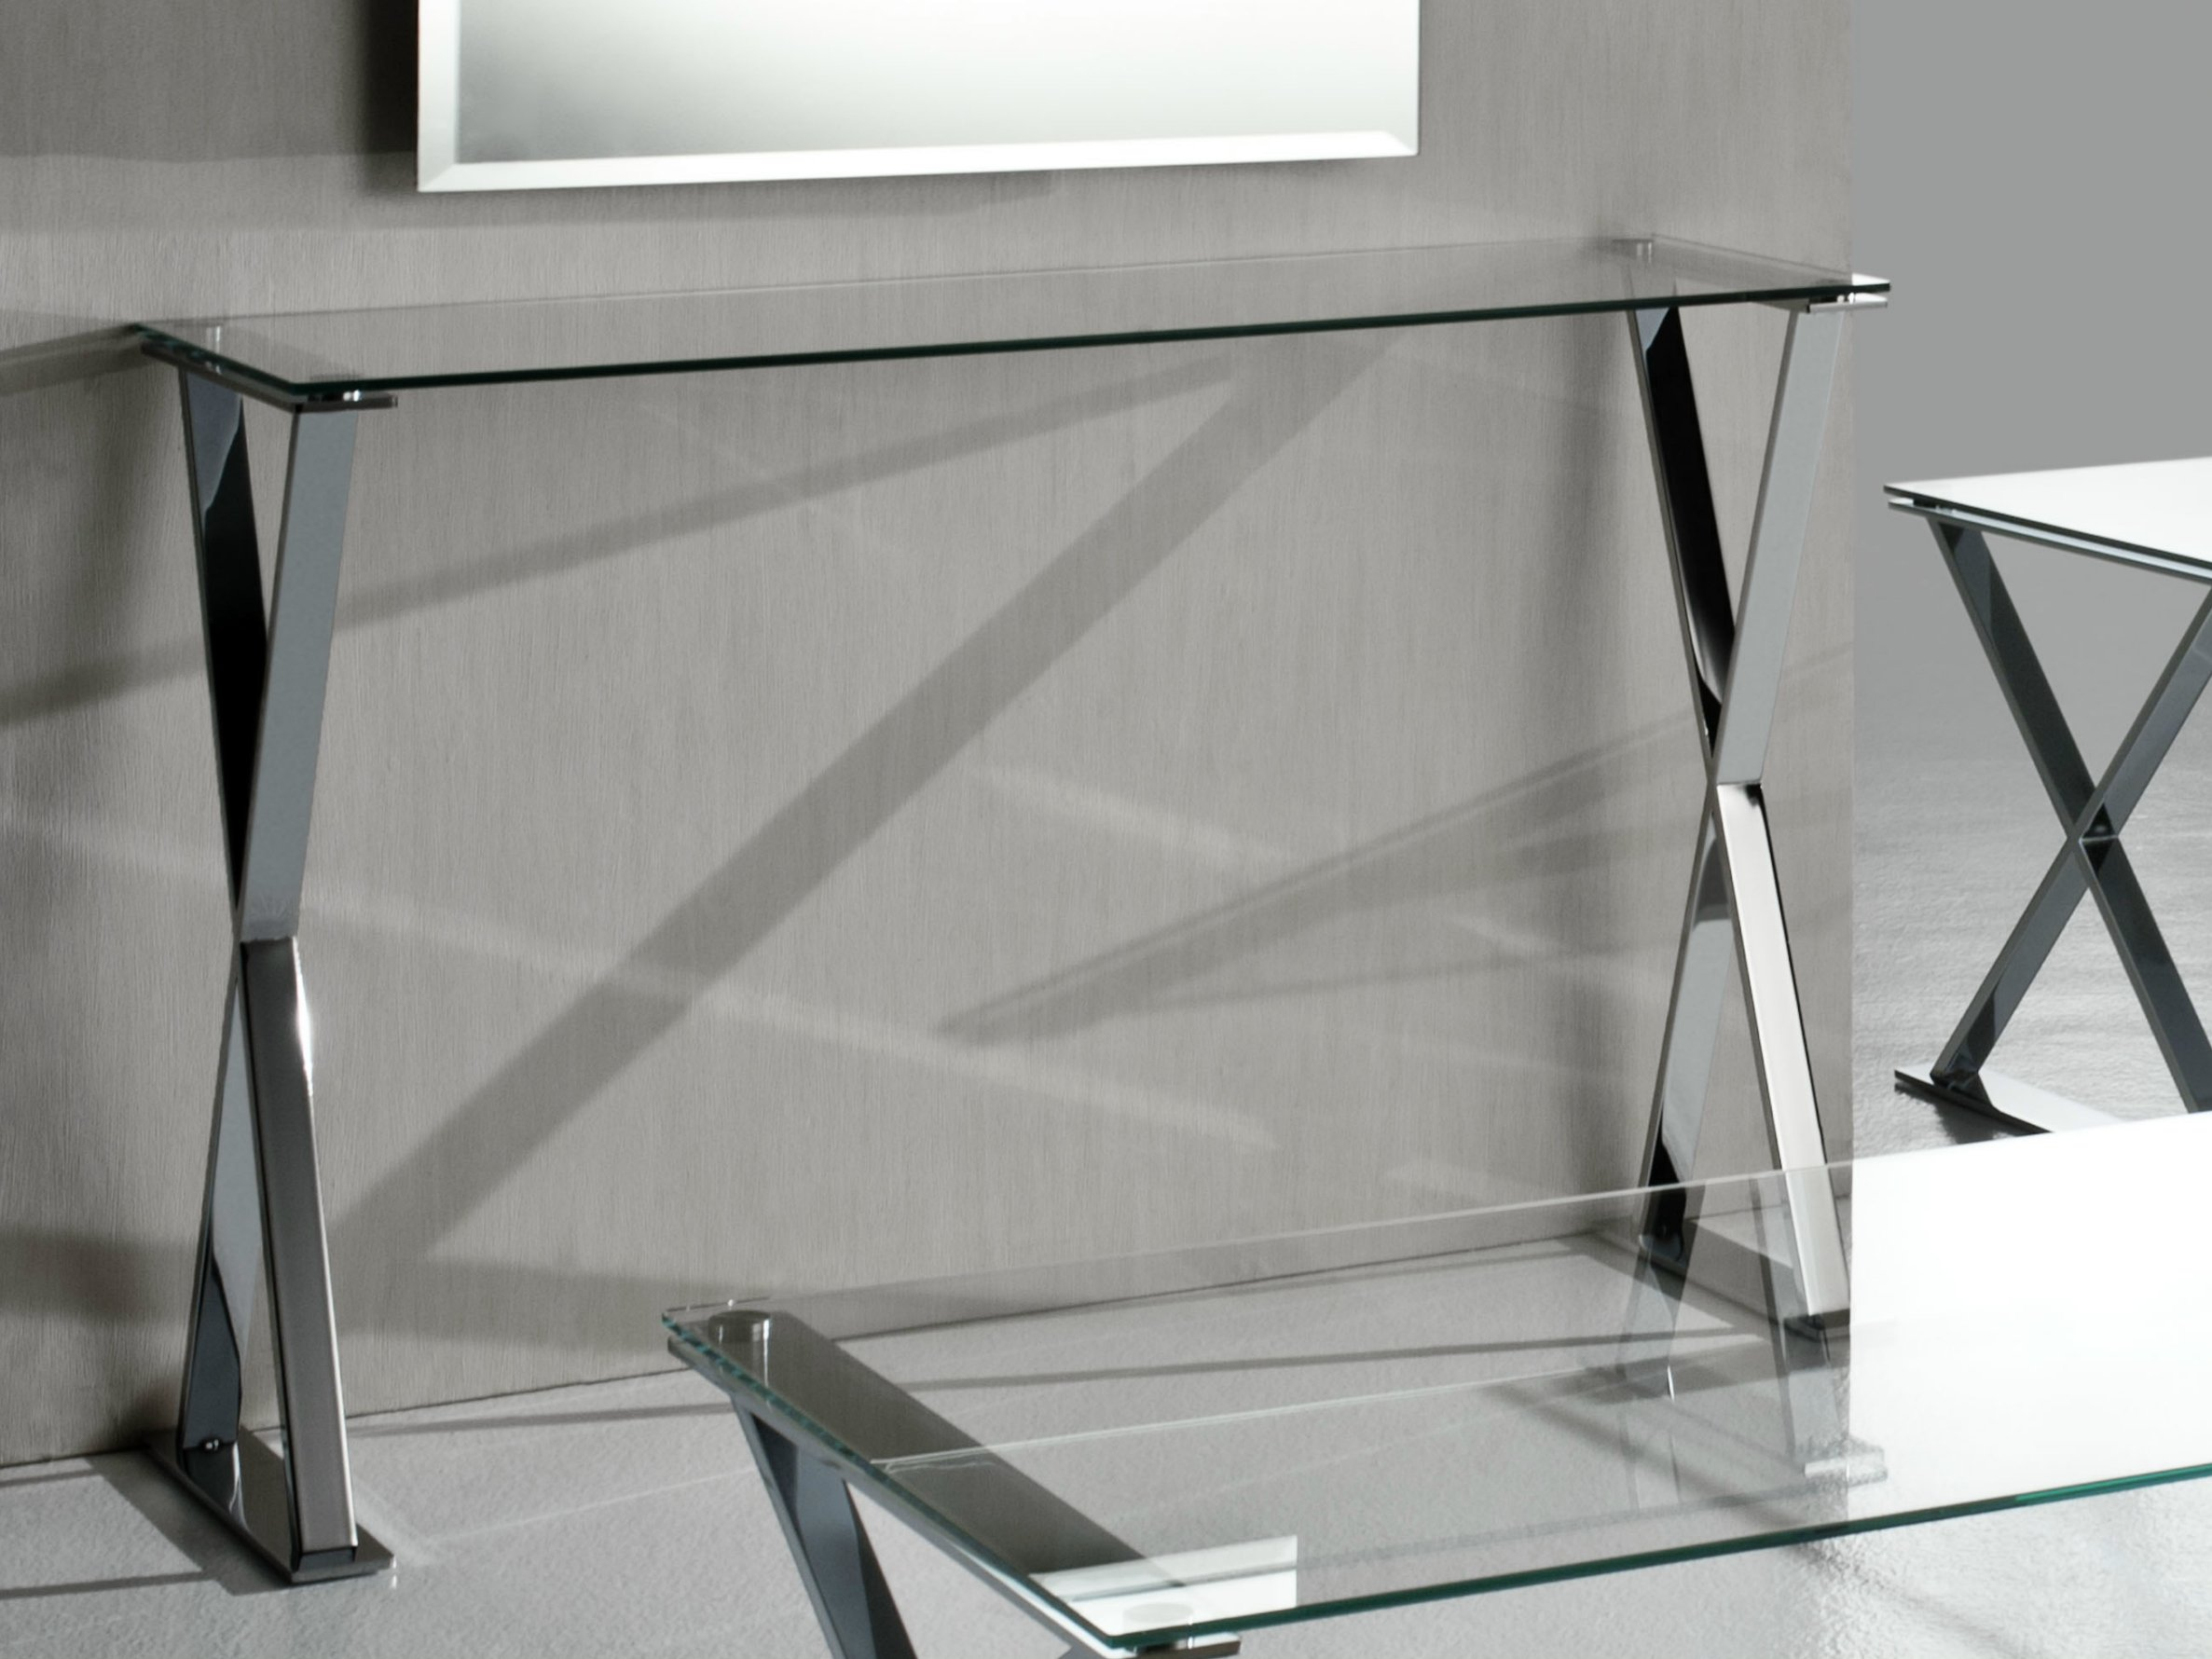 ics konsolentisch by orsenigo design studio orsenigo. Black Bedroom Furniture Sets. Home Design Ideas